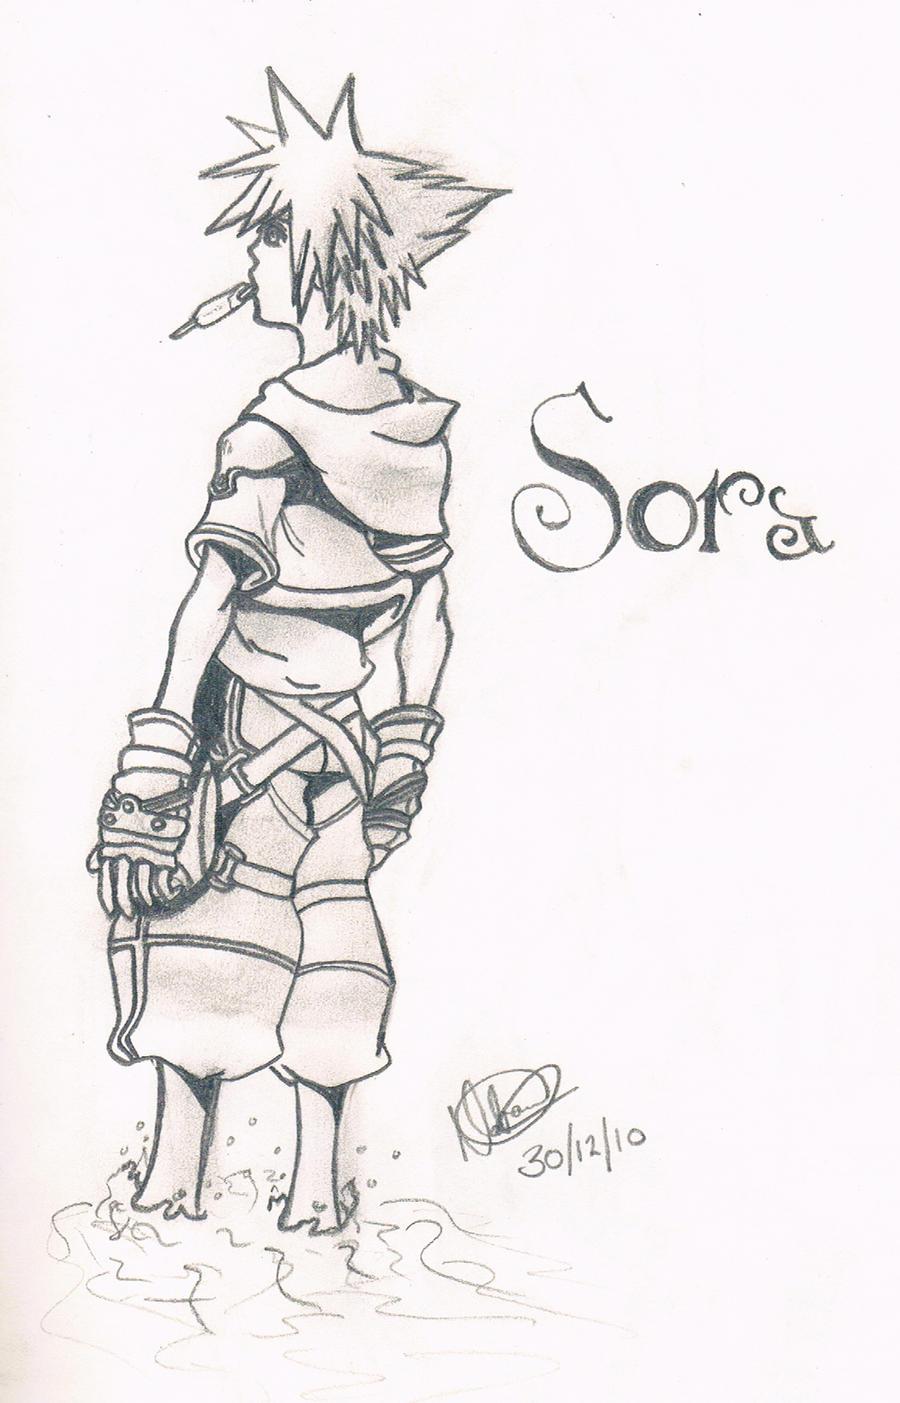 Sora - menu kh2 by Natini